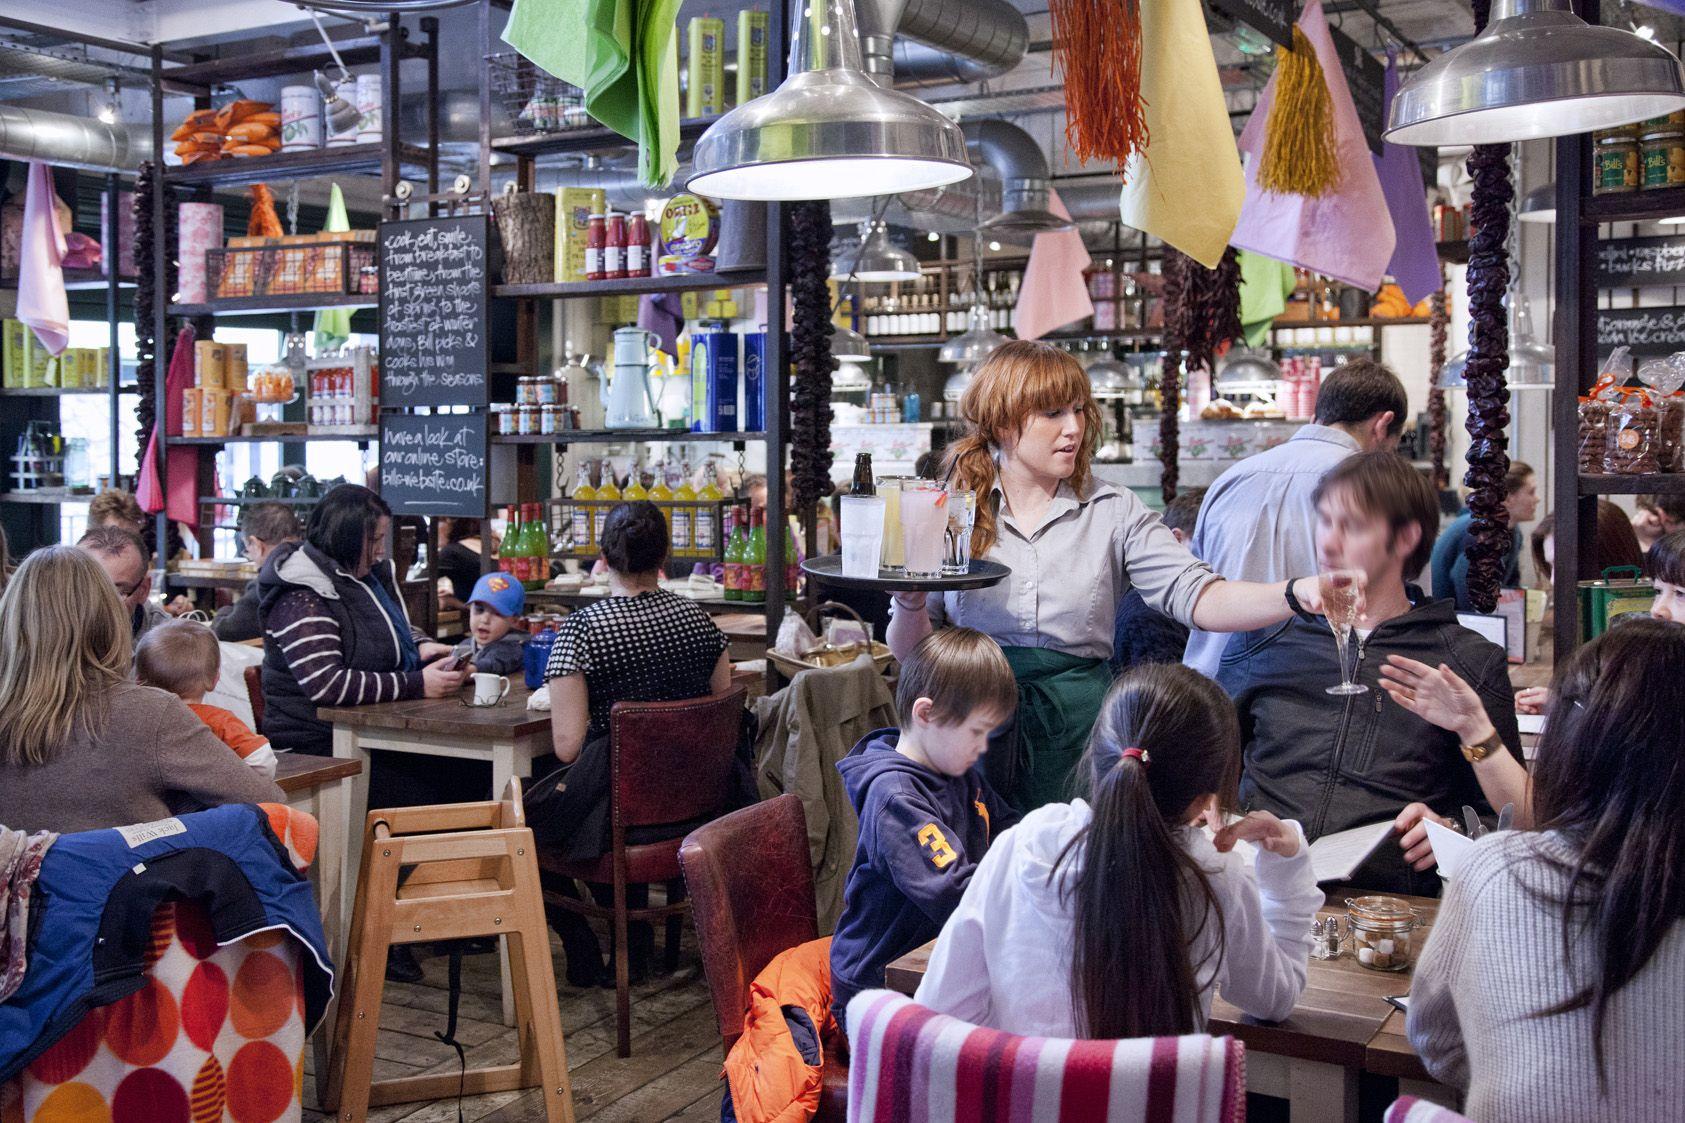 busy restaurant interior. Modren Interior A Busy Restaurant Interior For Busy Restaurant Interior S